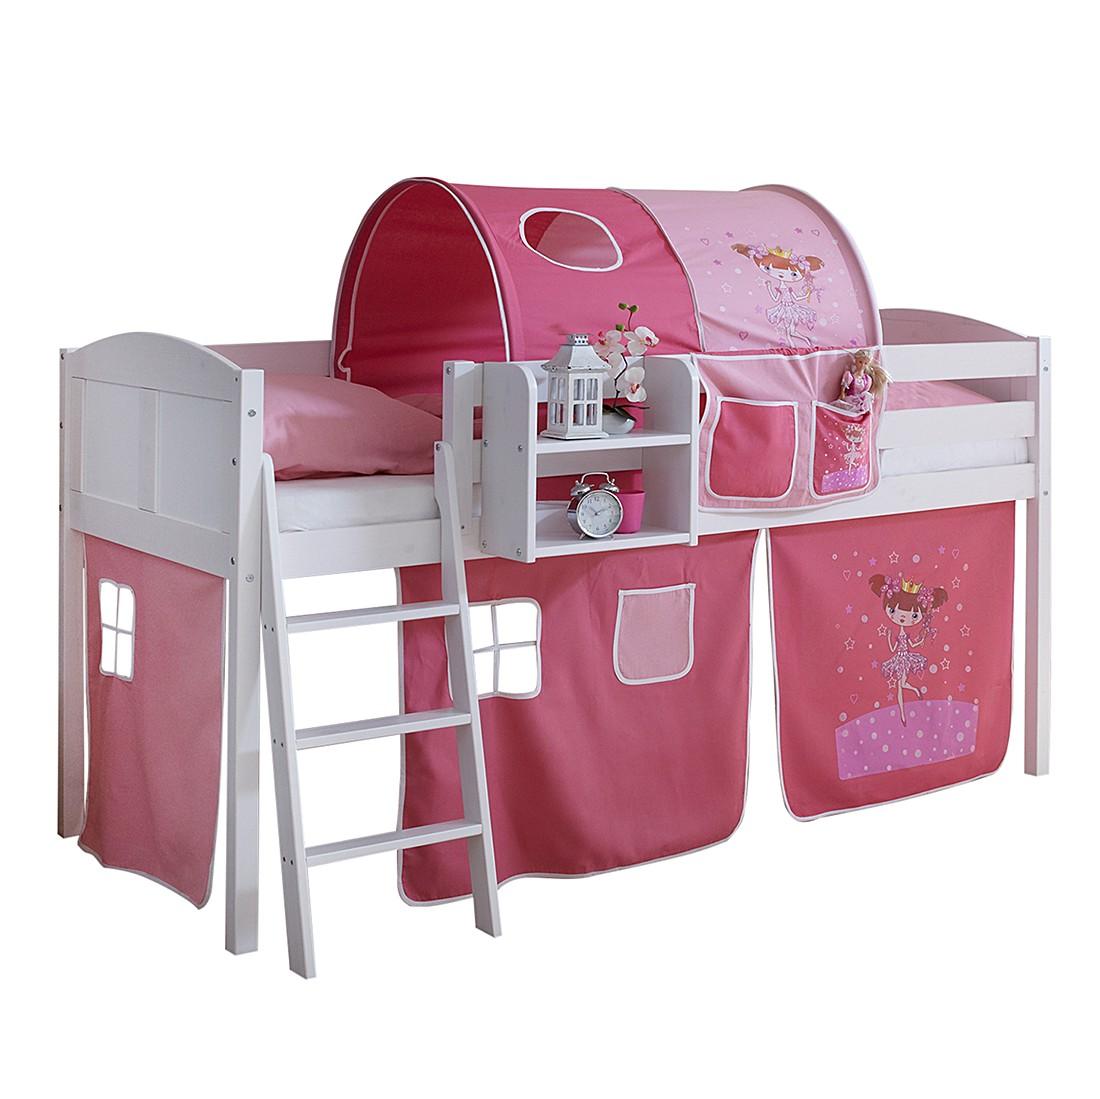 halbhochbett eric motiv kiefer massiv textil wei pink mit tunnel ticaa g nstig. Black Bedroom Furniture Sets. Home Design Ideas